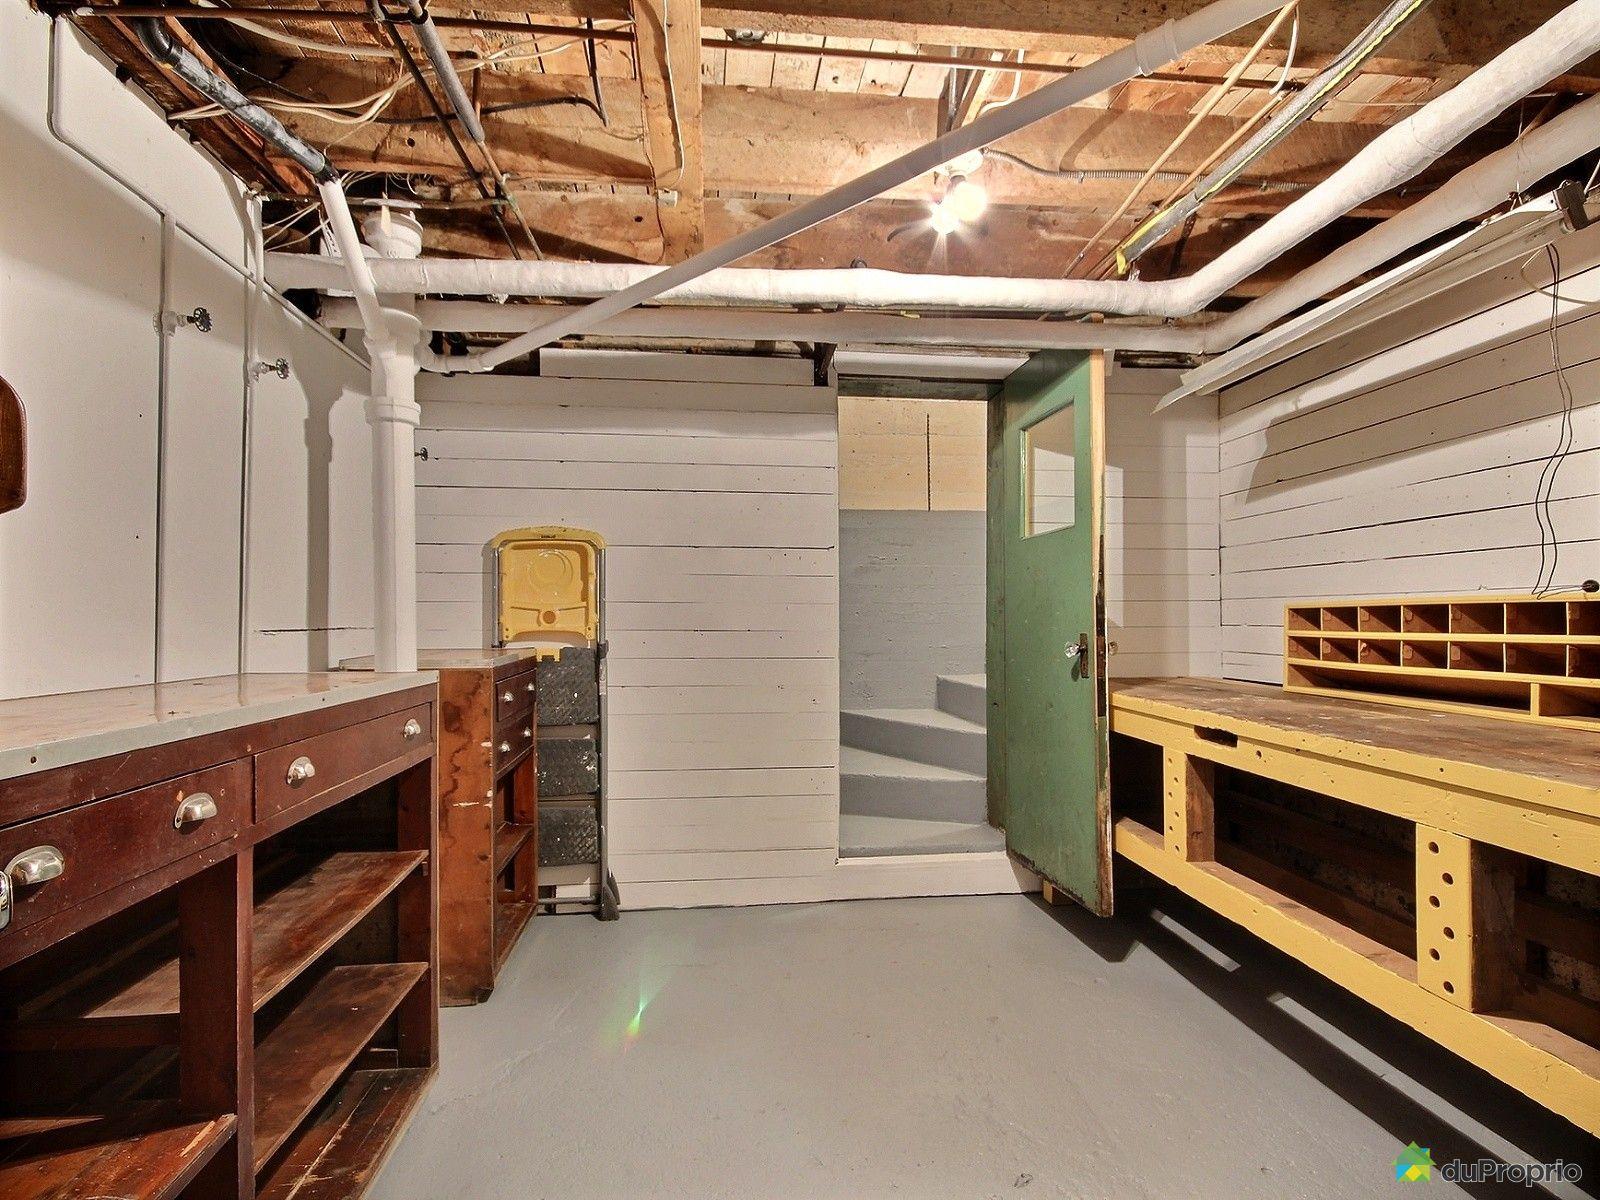 Maison vendre salaberry de valleyfield 67 rue wilfrid immobilier qu bec - Atelier menuiserie a vendre ...